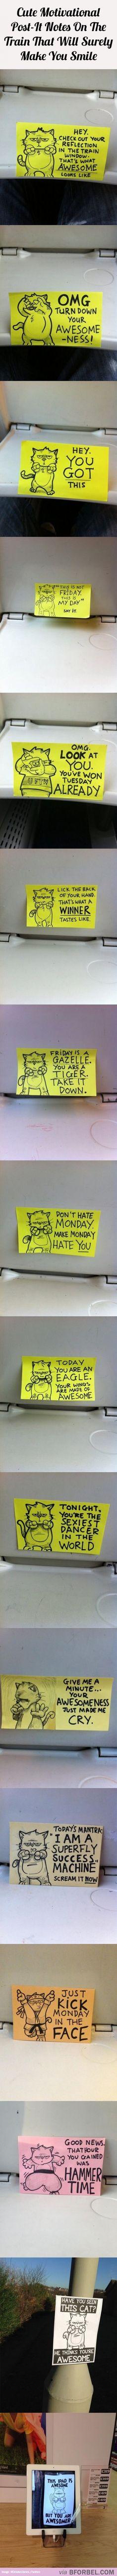 Hilarious Motivational Cat PostIt Notes Found On A Train On - Hilarious motivational cat post notes found train